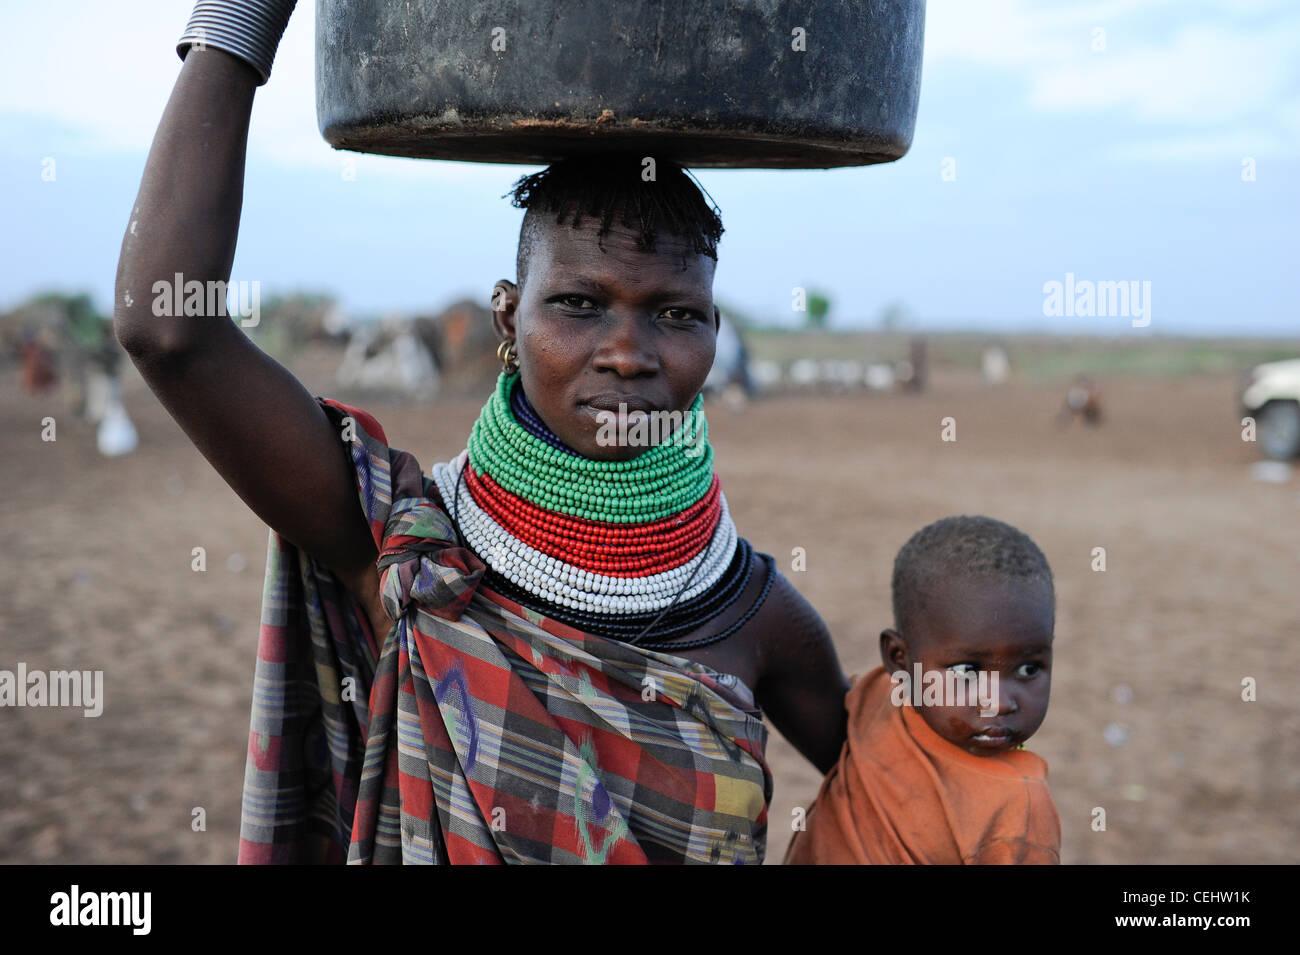 Africa KENIA Turkana Region, Kakuma, Turkana tribe suffer from drought and food shortage, food distribution by Don Stock Photo